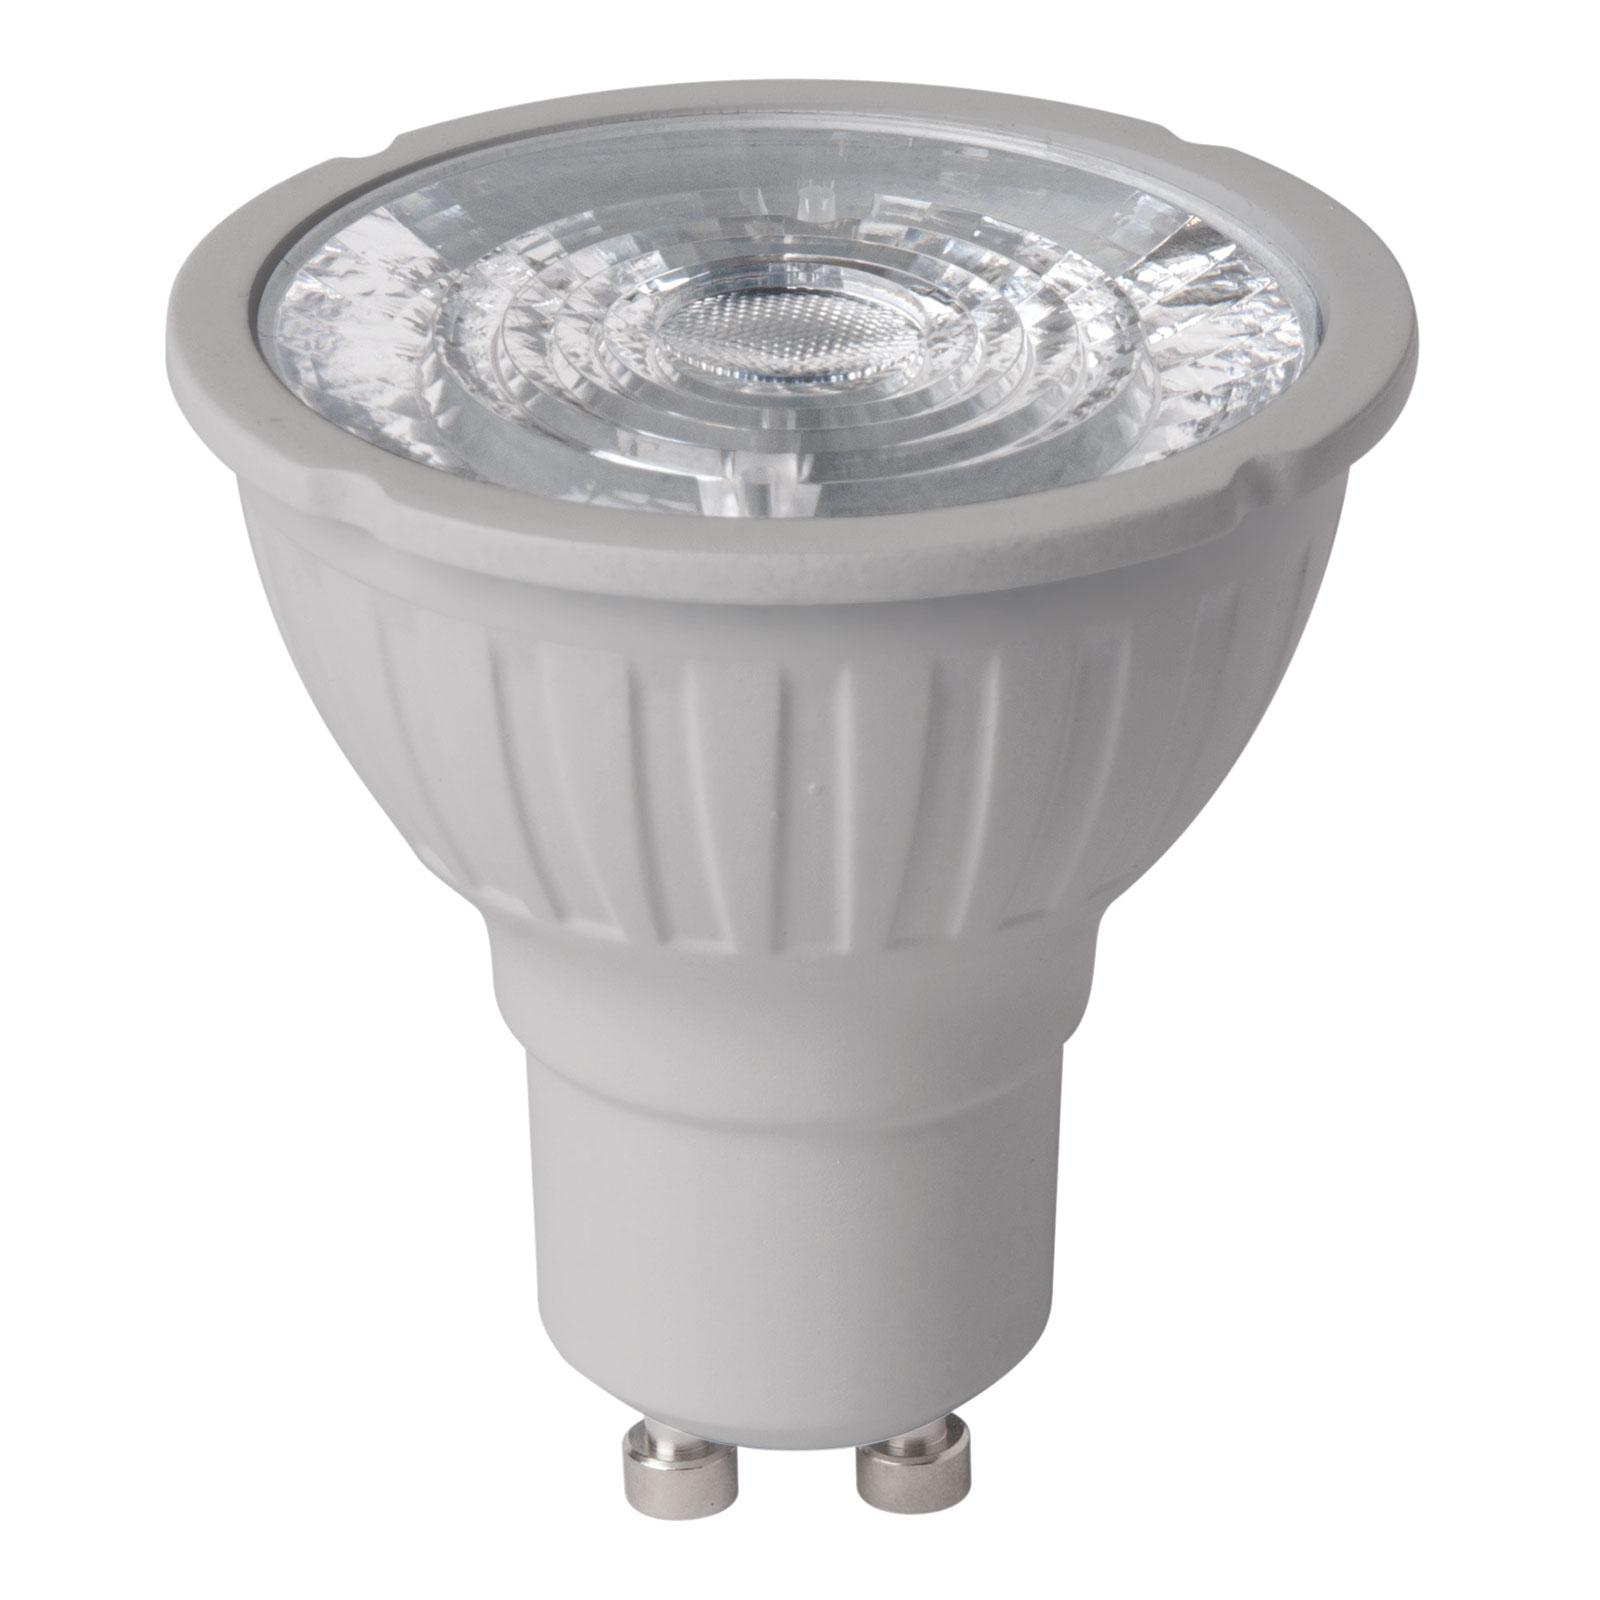 Reflektor LED GU10 dual beam 5,2W 2800K